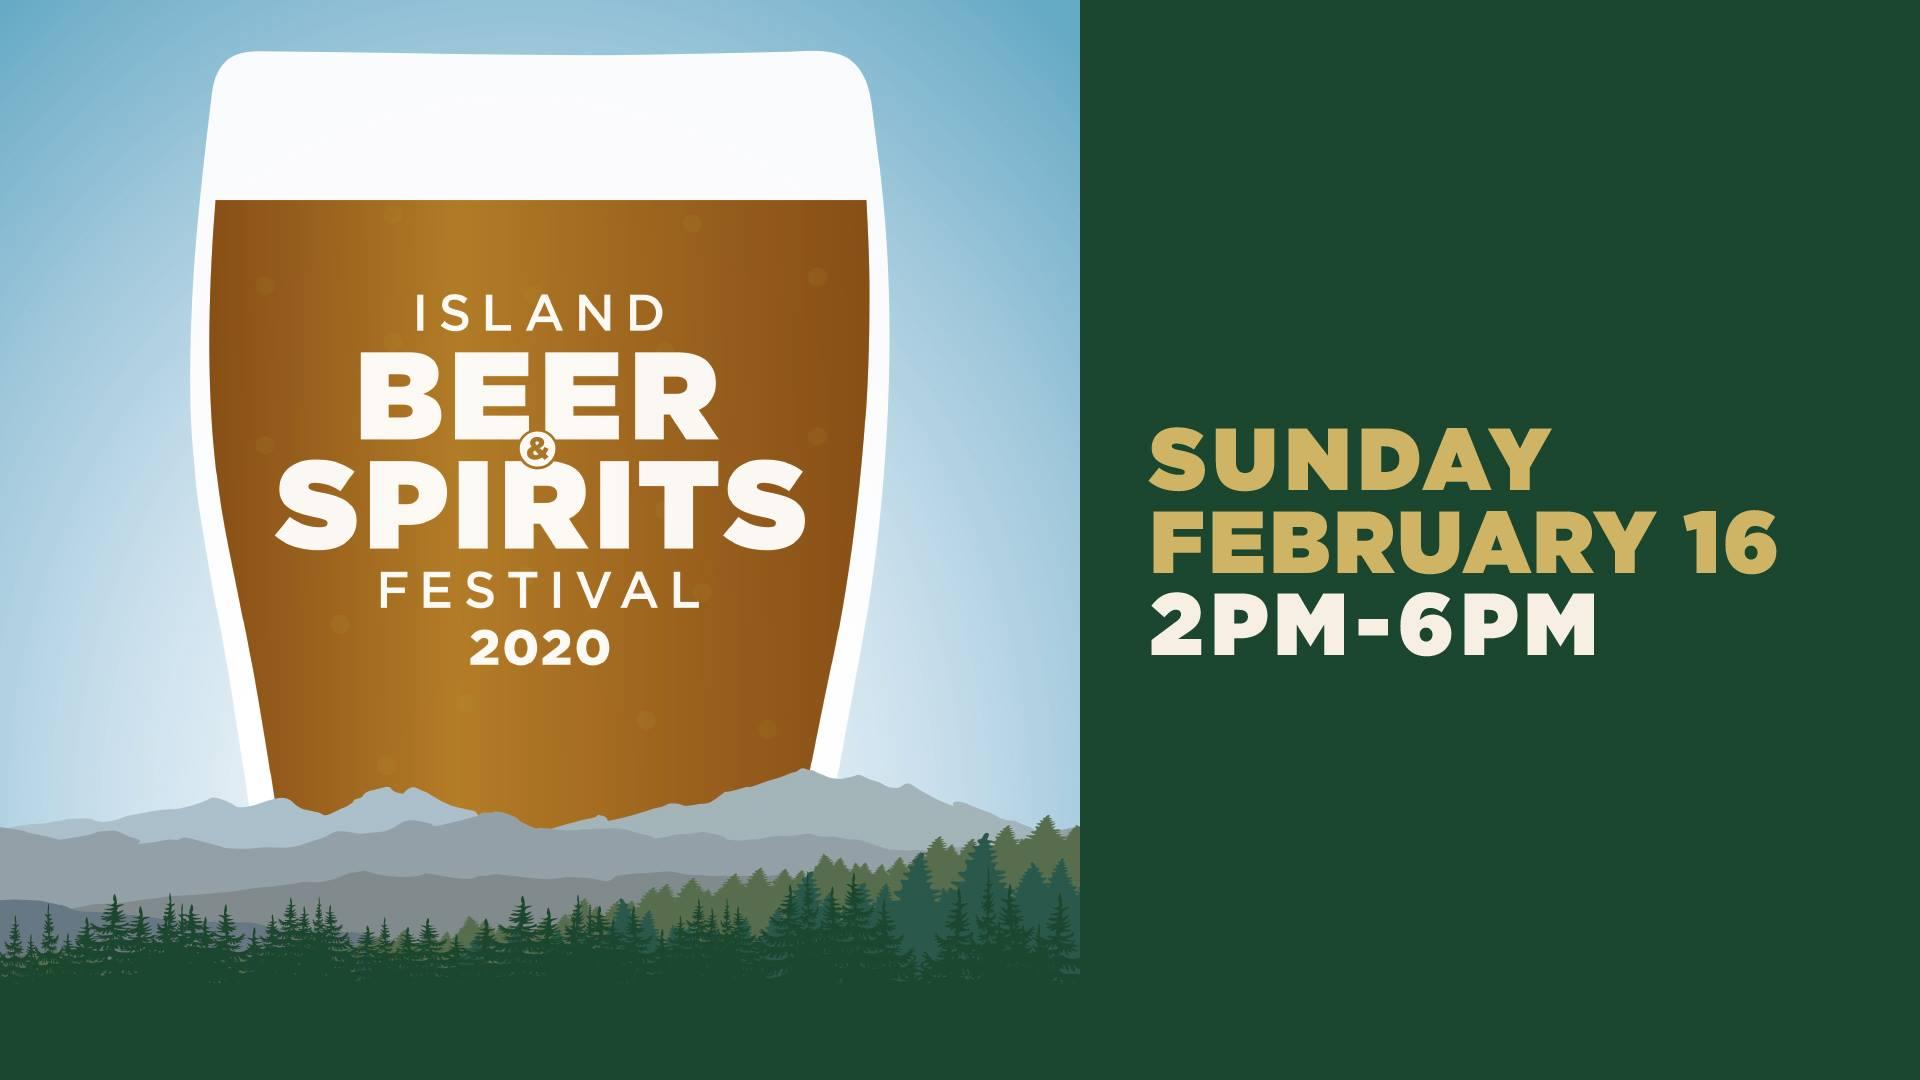 11th Annual Island Beer & Spirits Festival